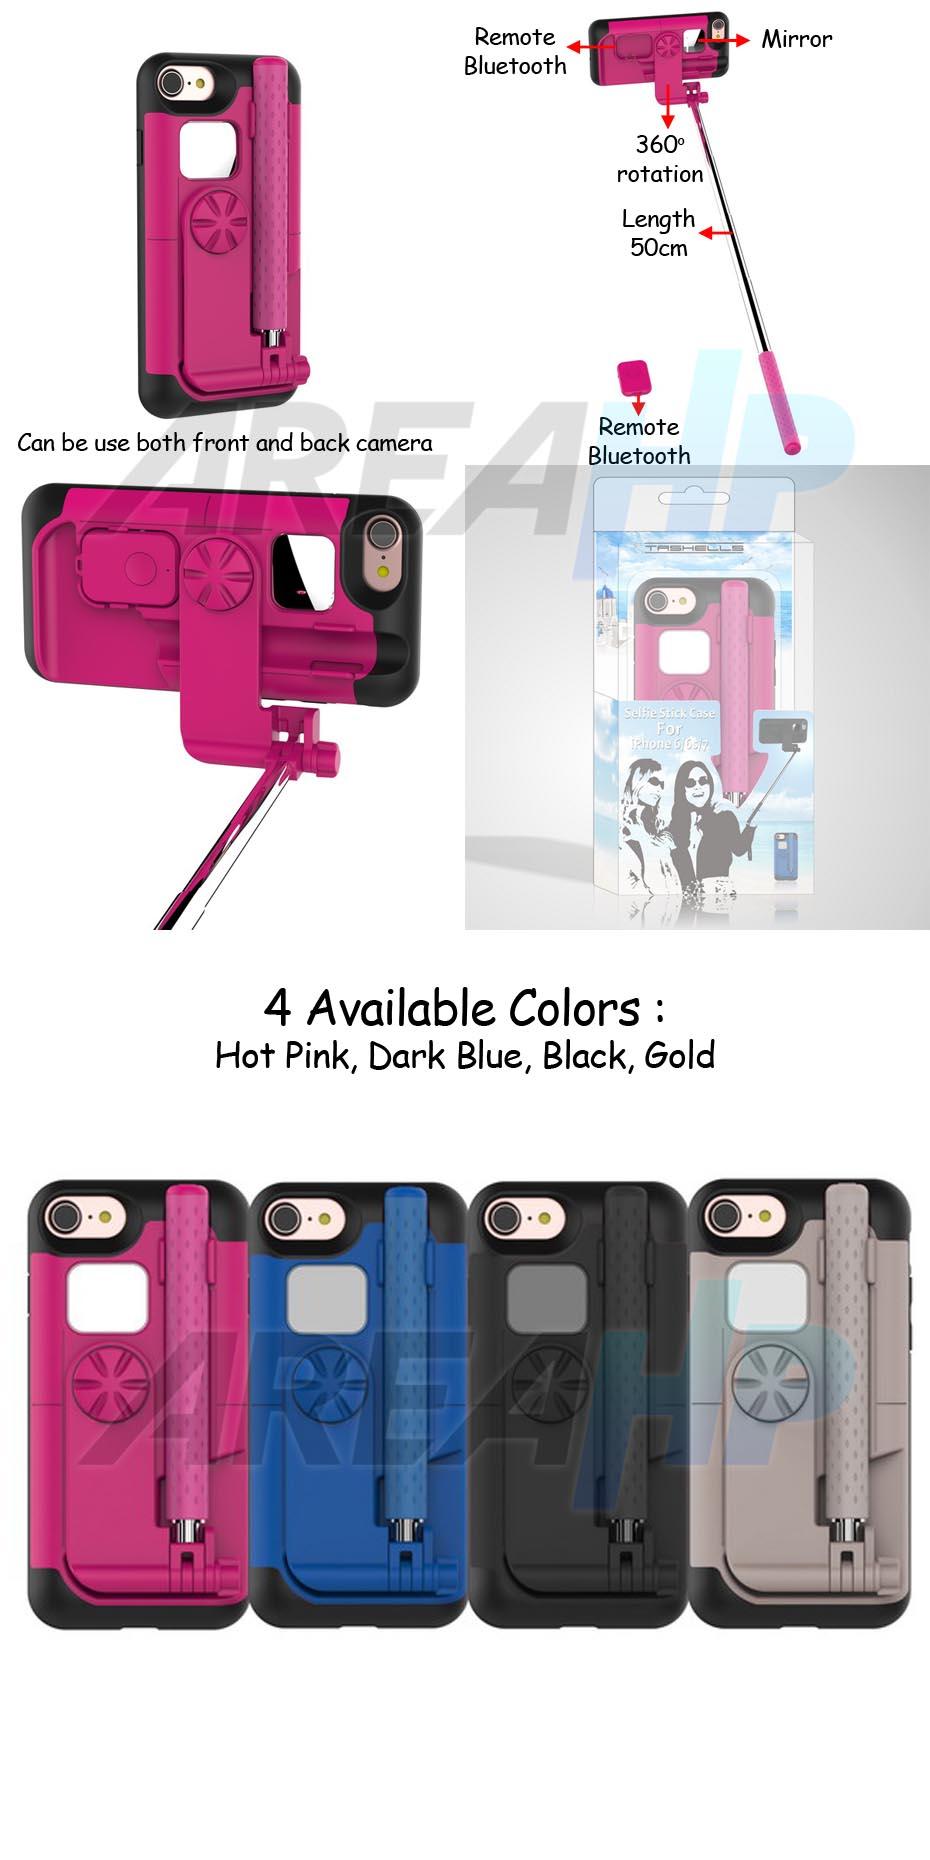 areahp tashells built in selfie stick case bluetooth for iphone 7. Black Bedroom Furniture Sets. Home Design Ideas